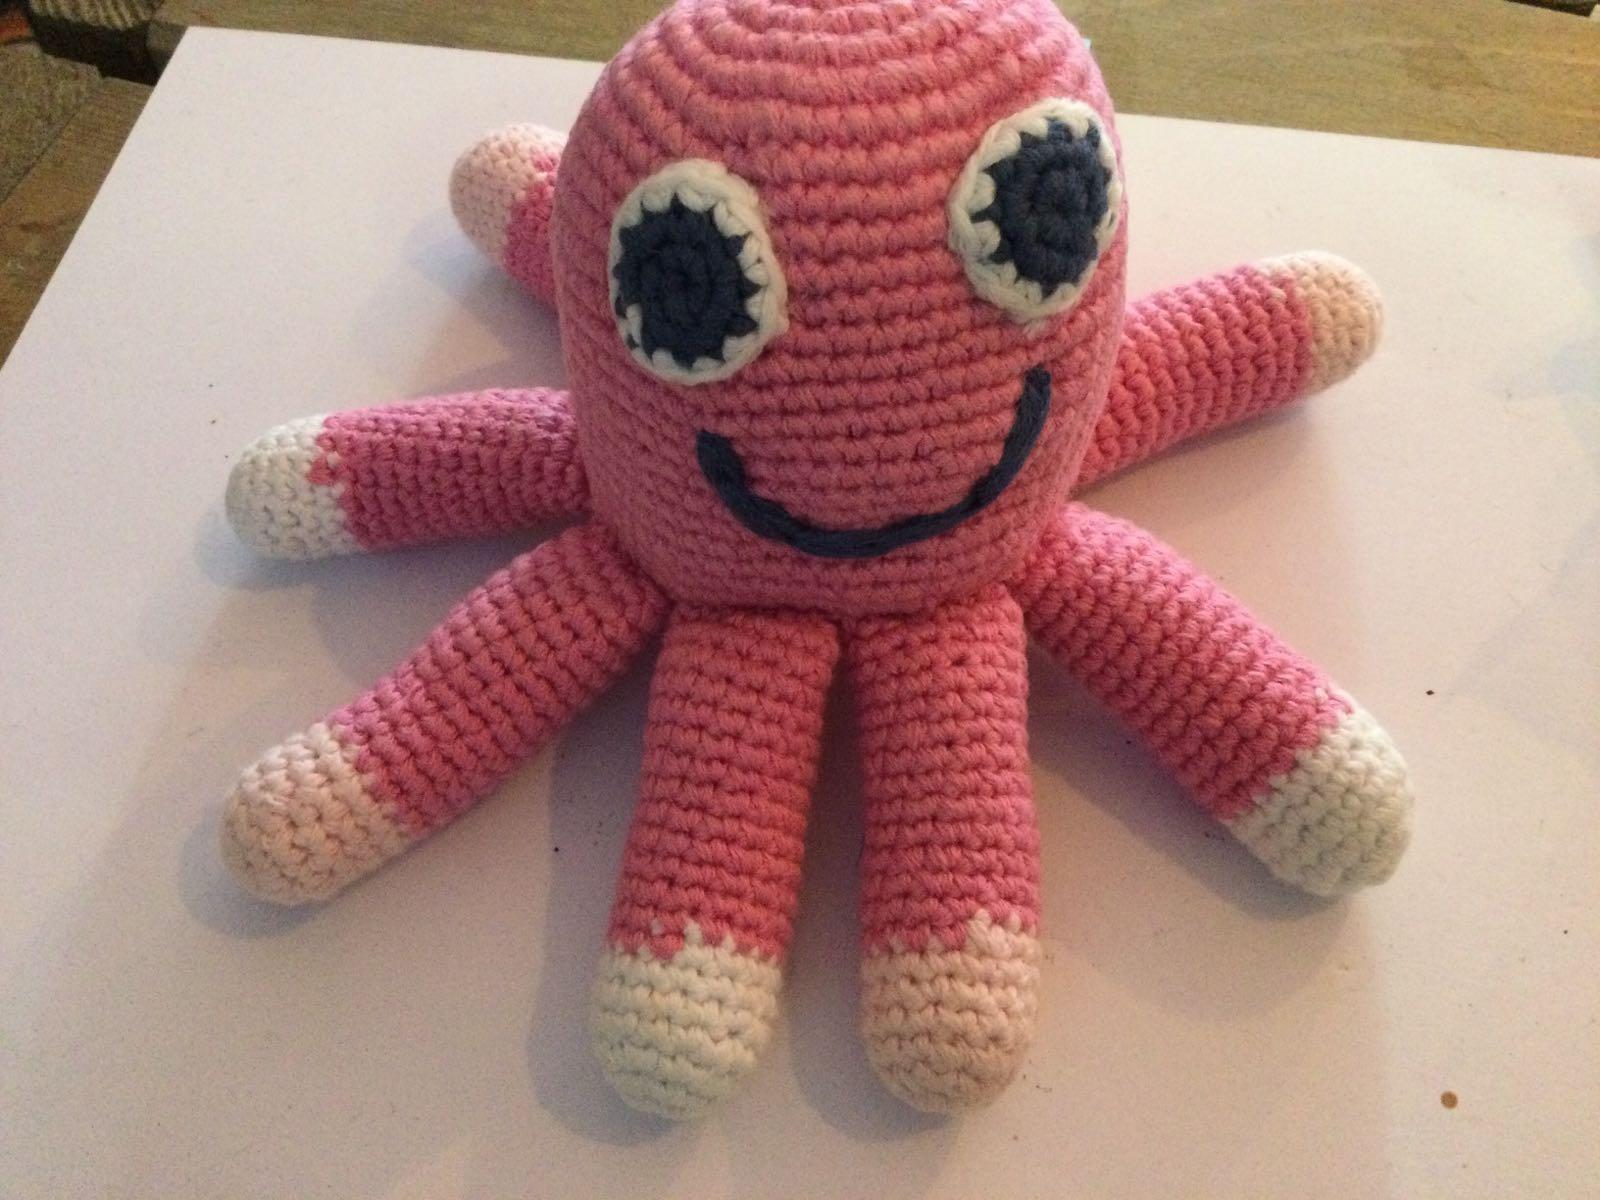 Pebble - Crochet Octopus Rattle - mid Pink